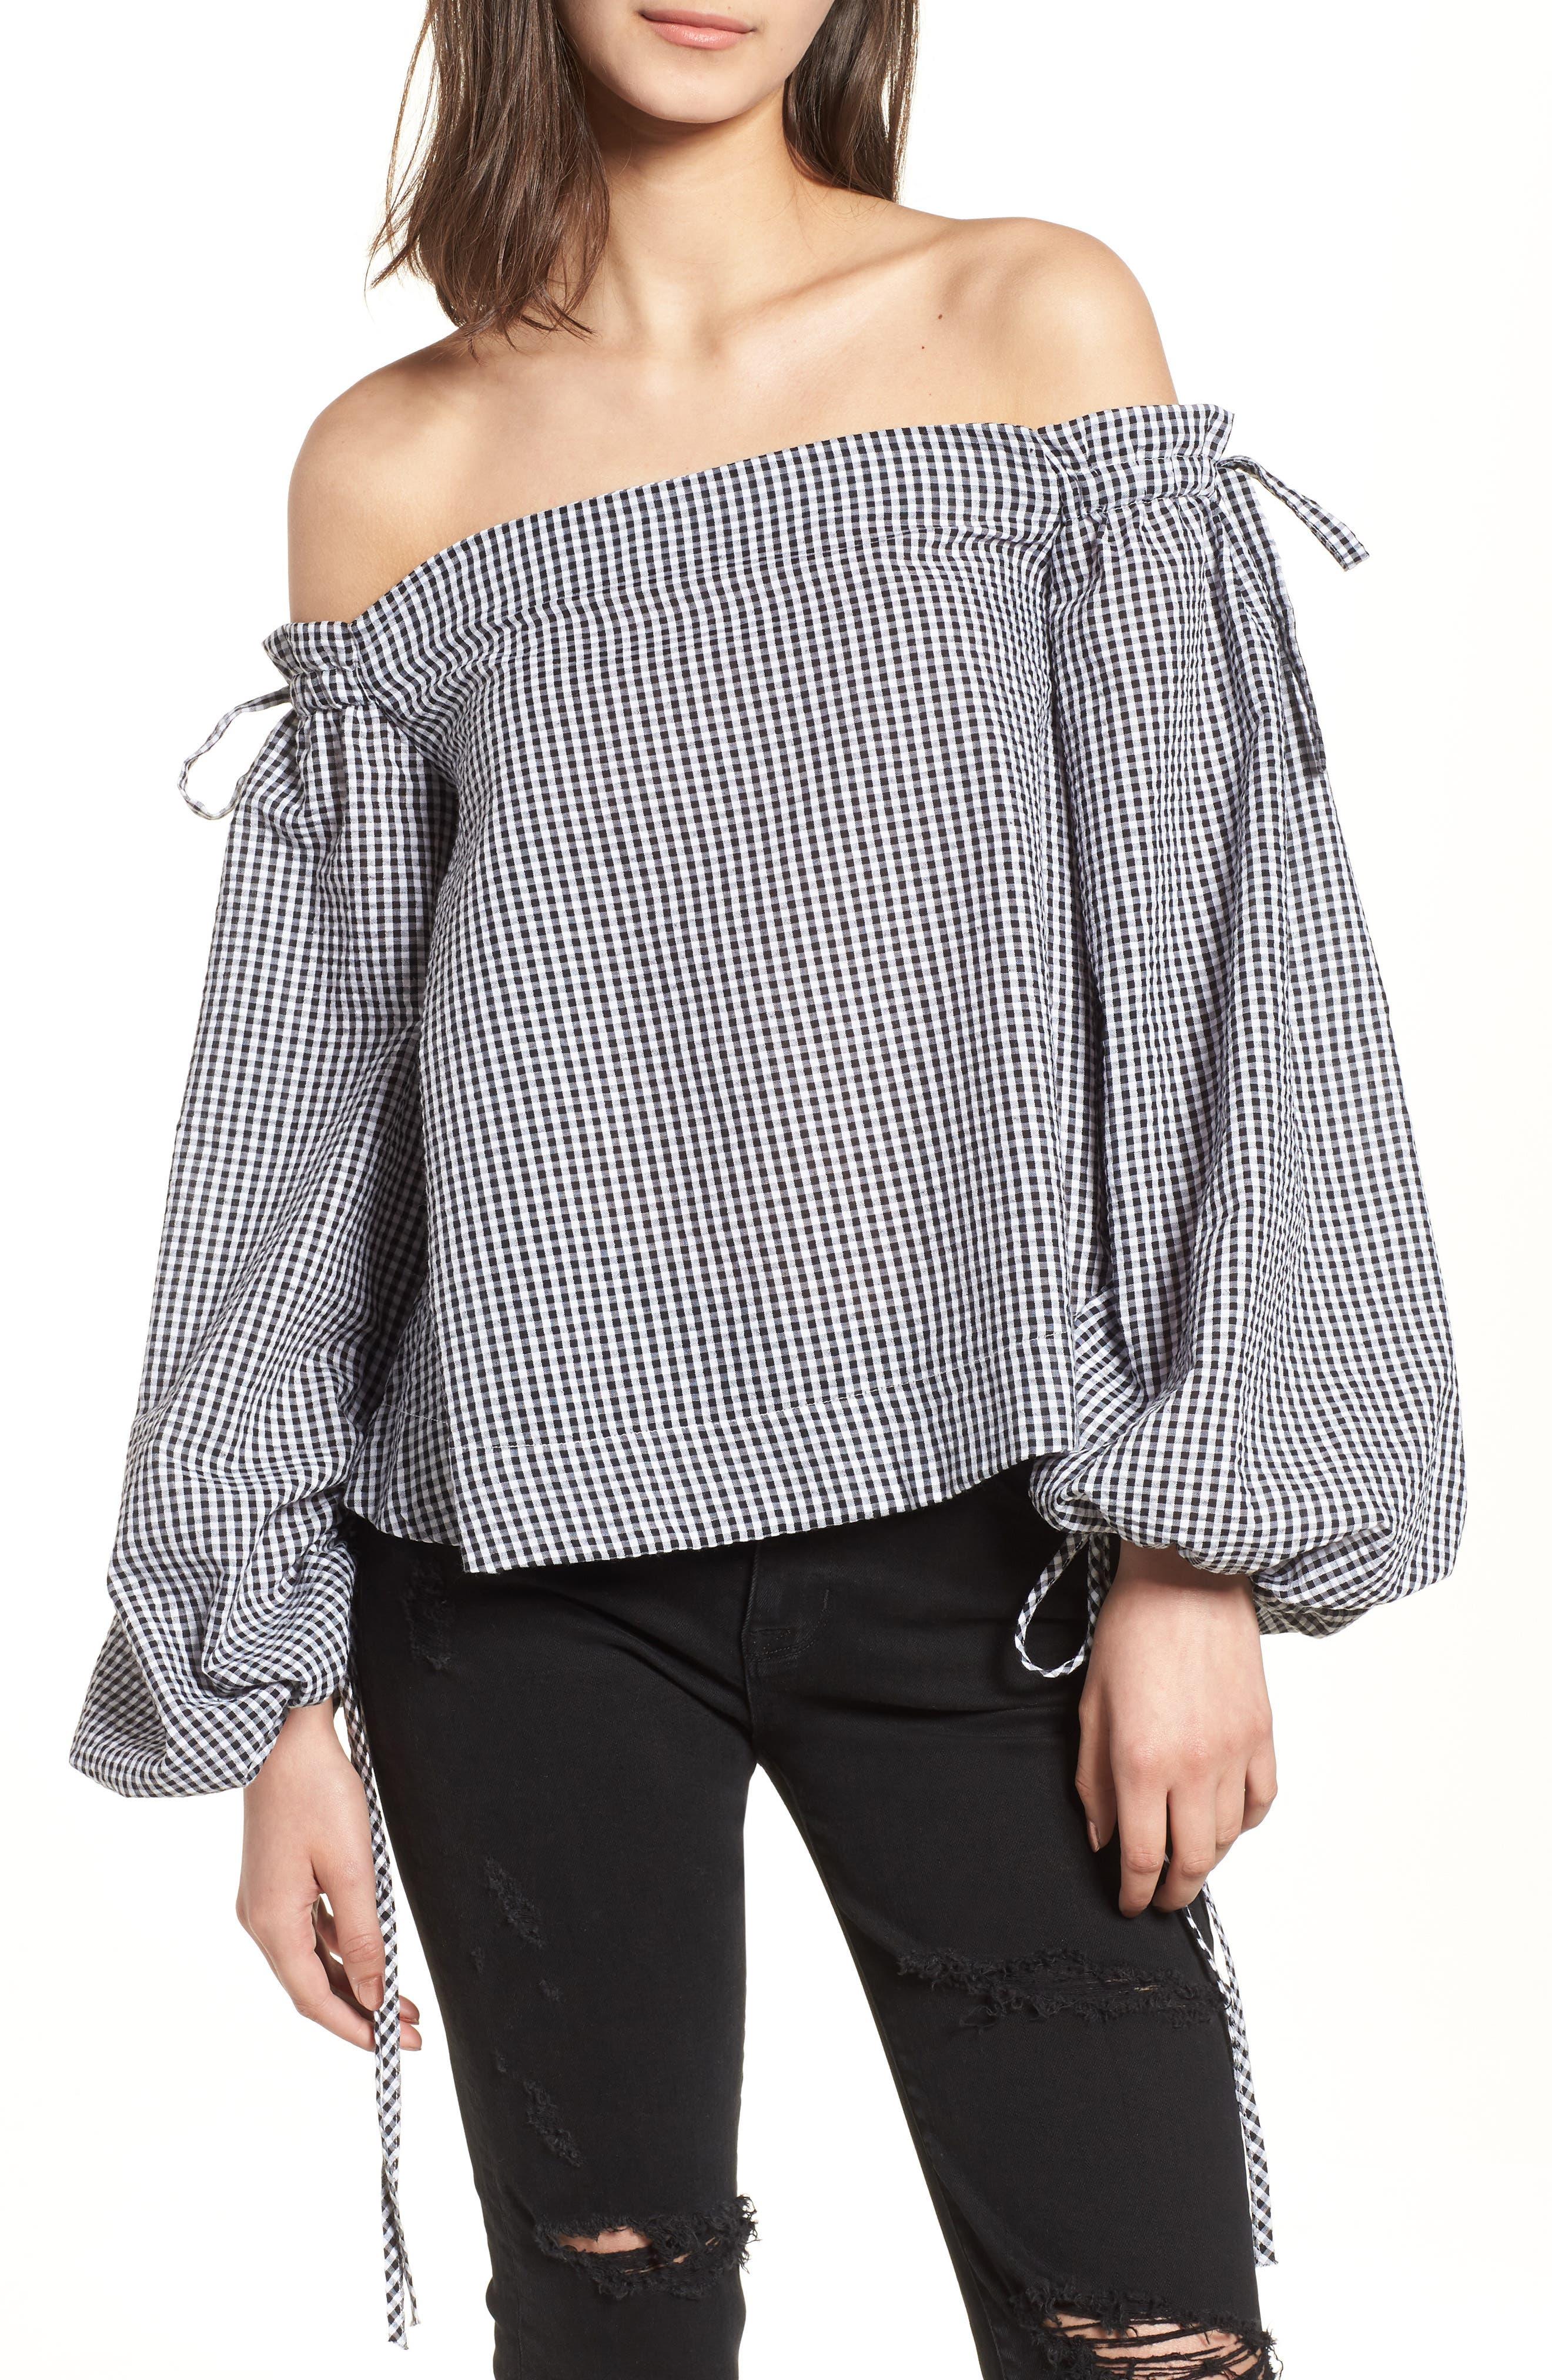 Gingham Off the Shoulder Top,                         Main,                         color, Black/ White Multi